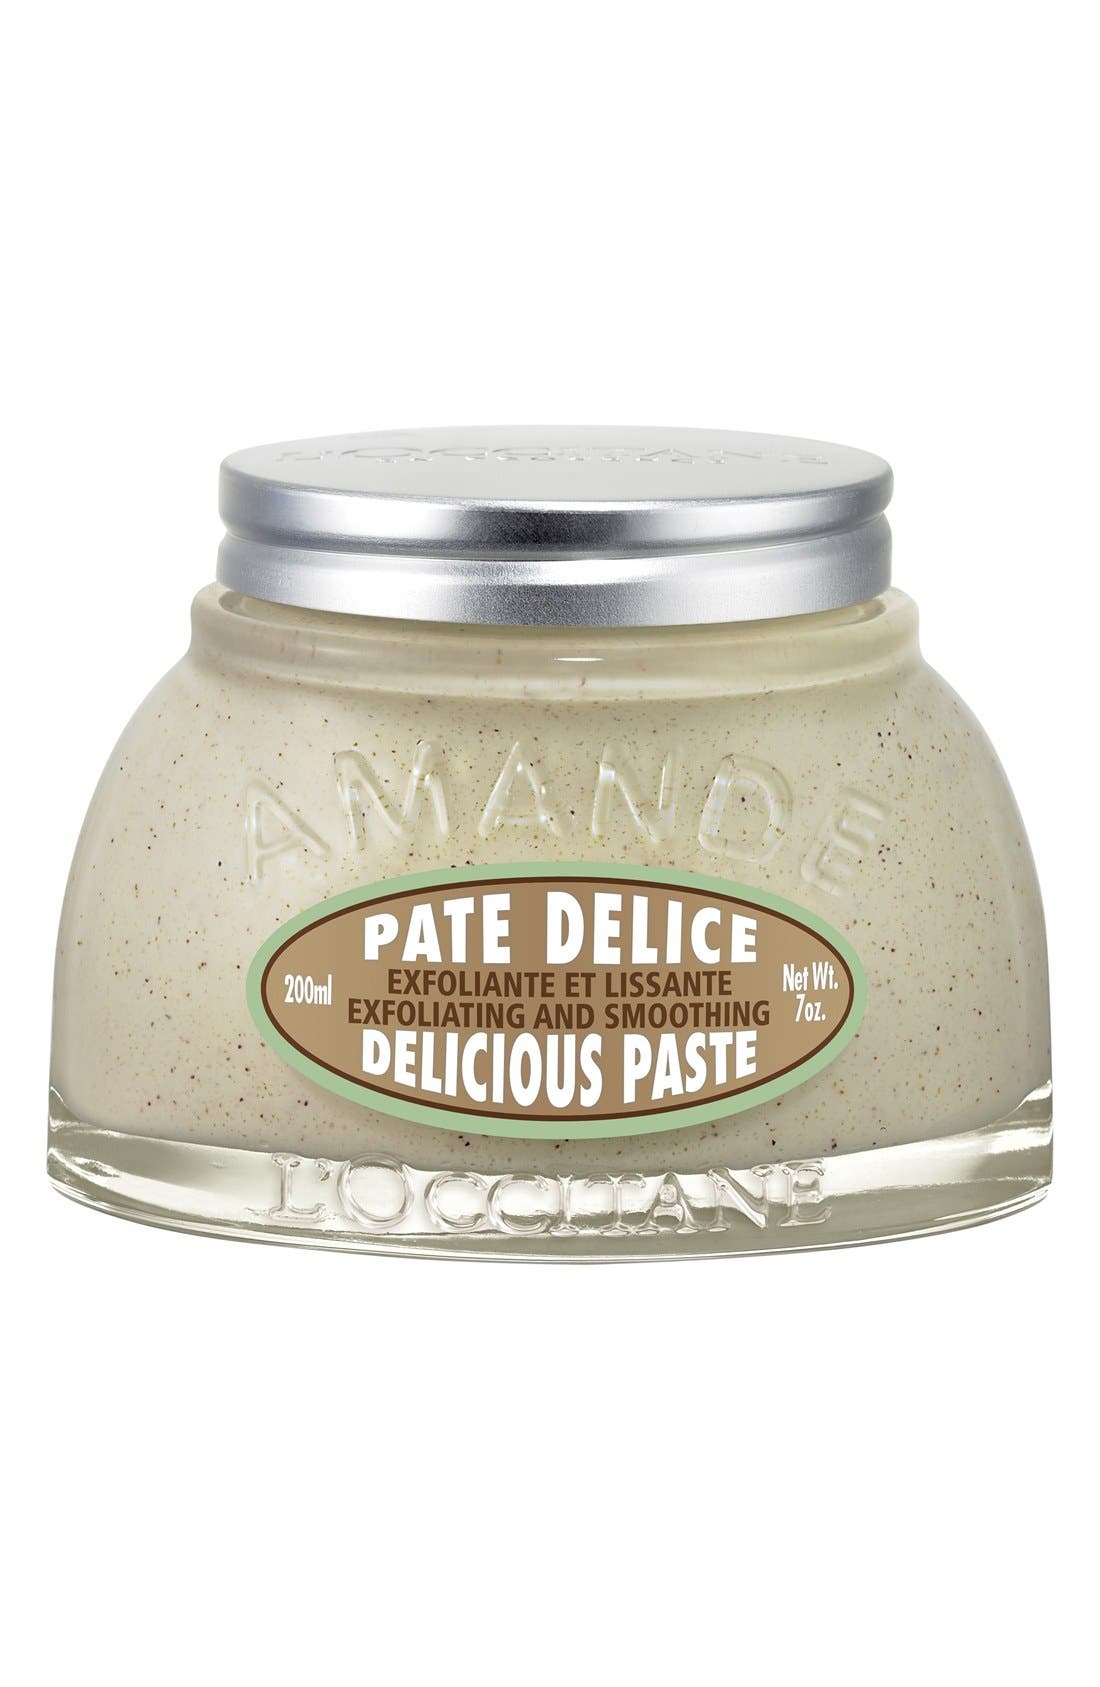 'Almond Delicious Paste' Exfoliating Butter,                         Main,                         color, 000